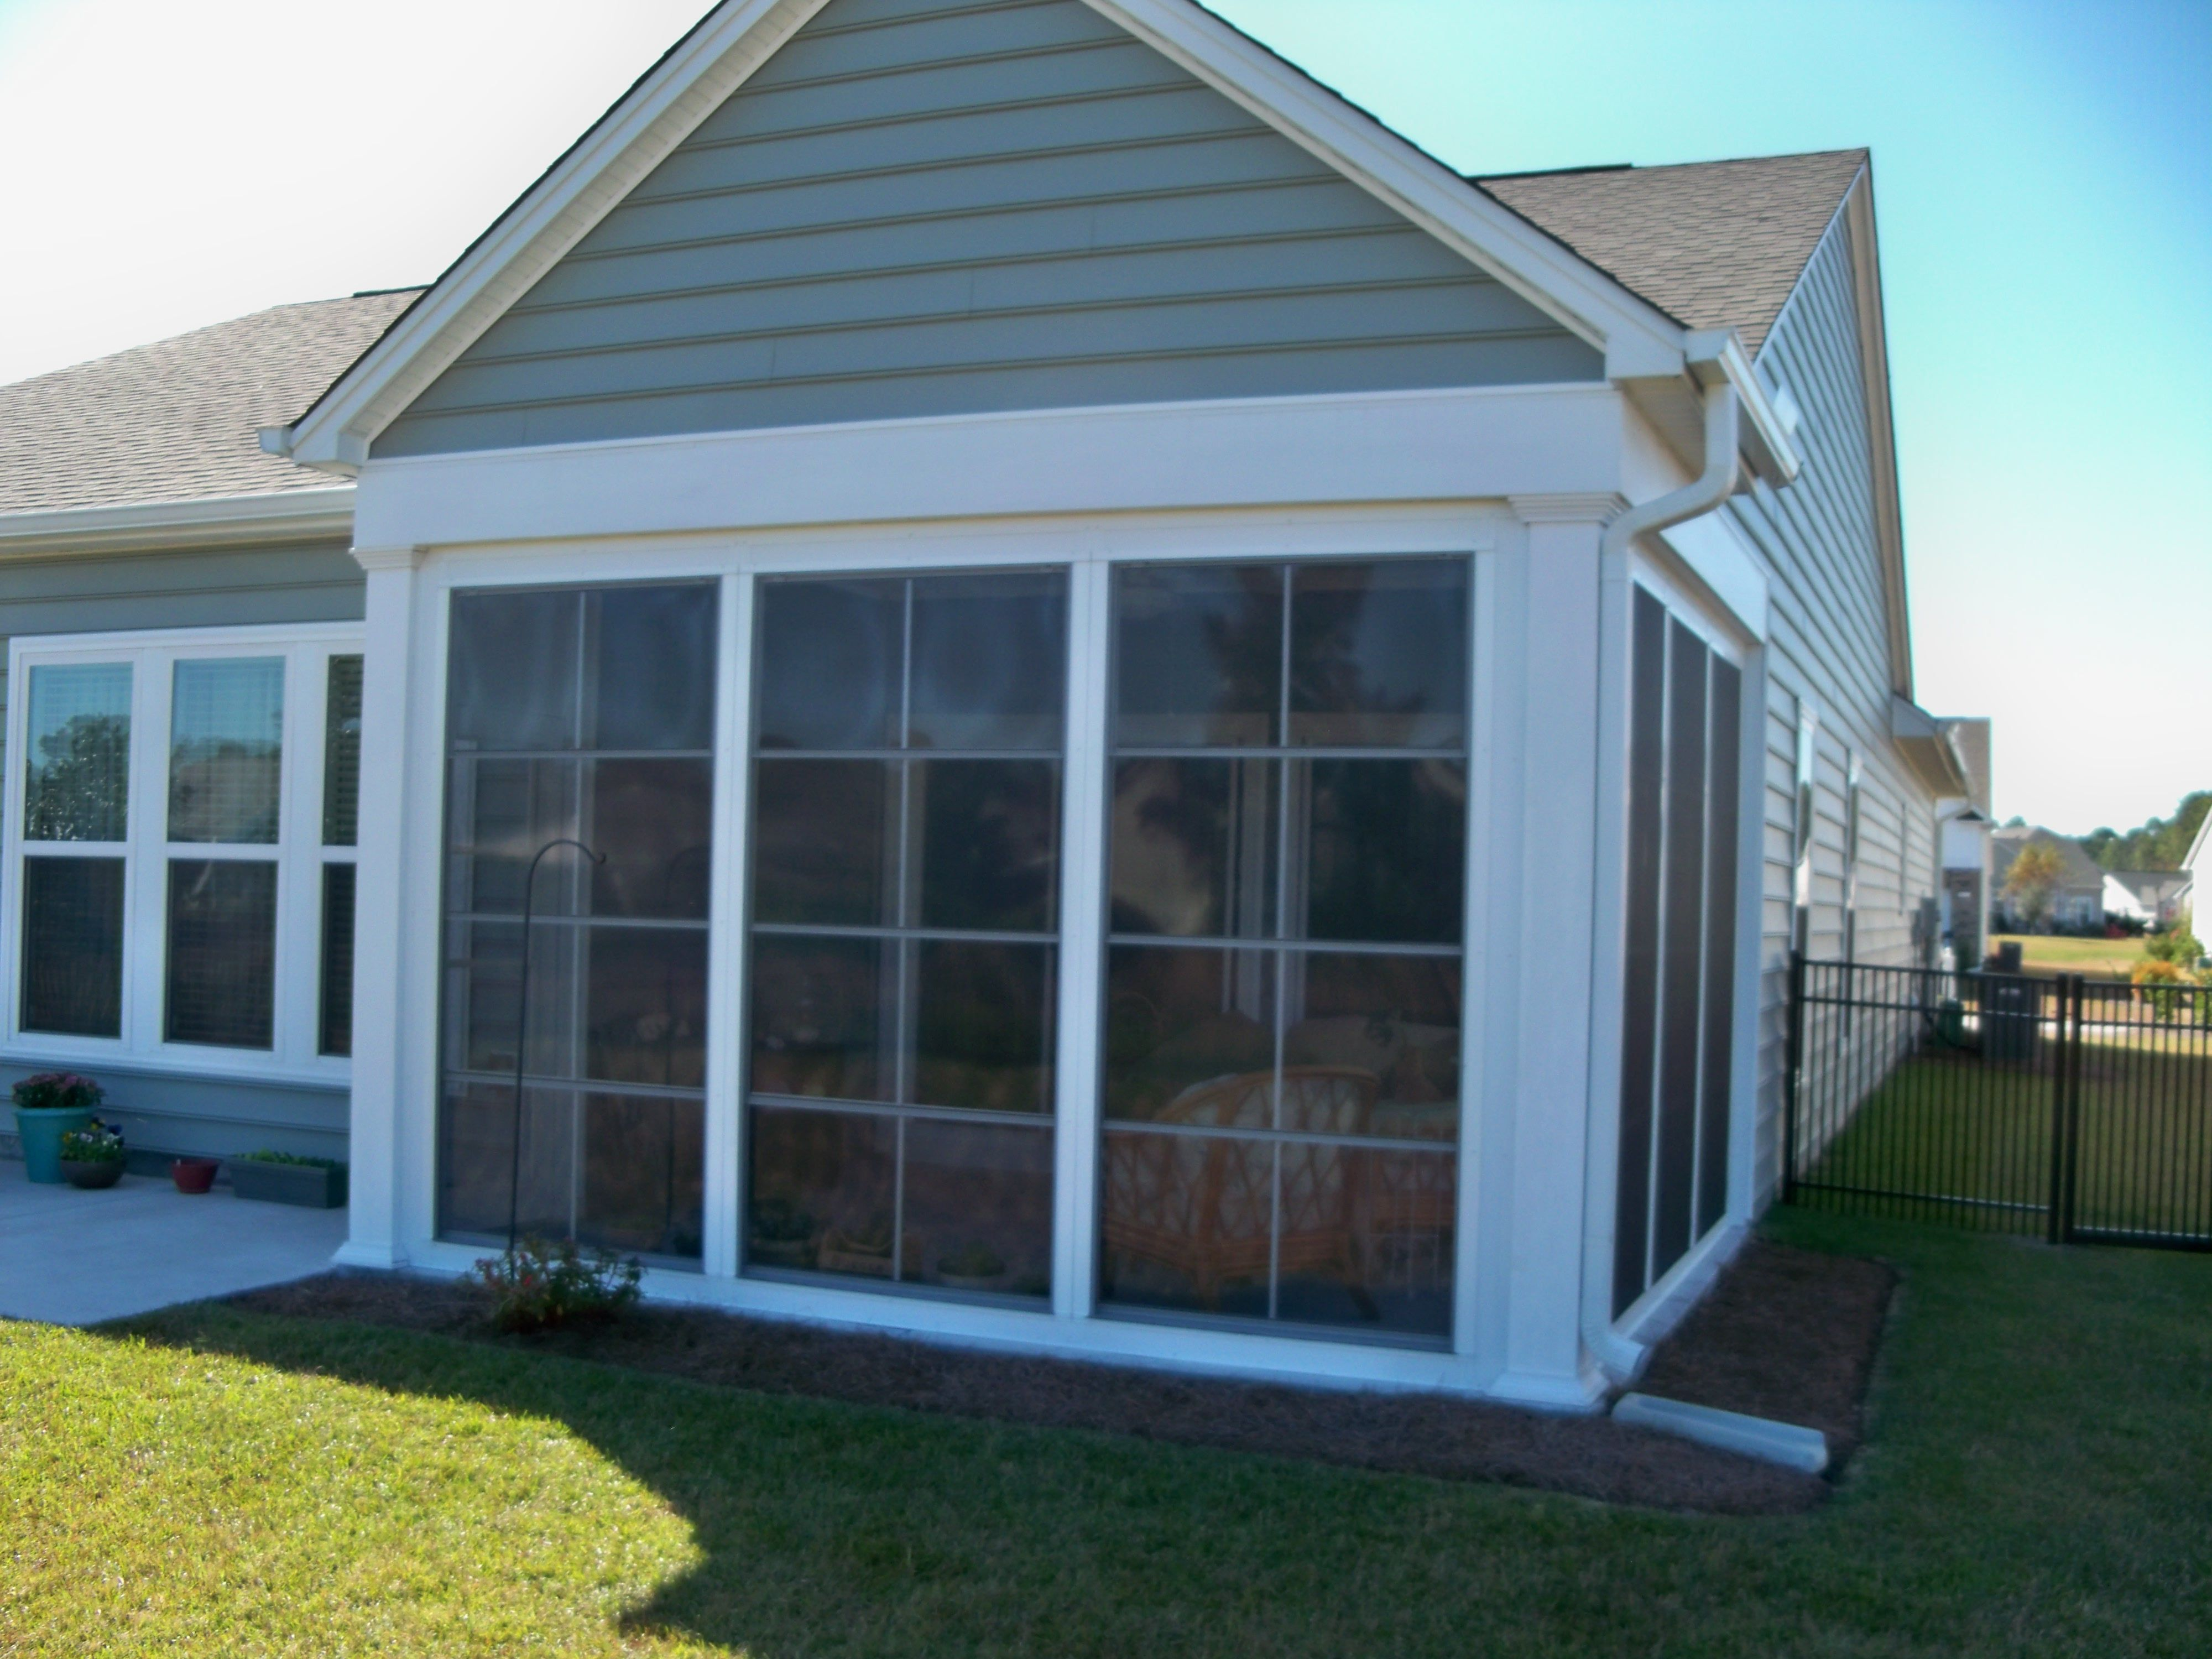 Enclosed Porches And Sunrooms | The Sunroom Store   Wilmington U0026 Greenville  NC | Sunrooms U0026